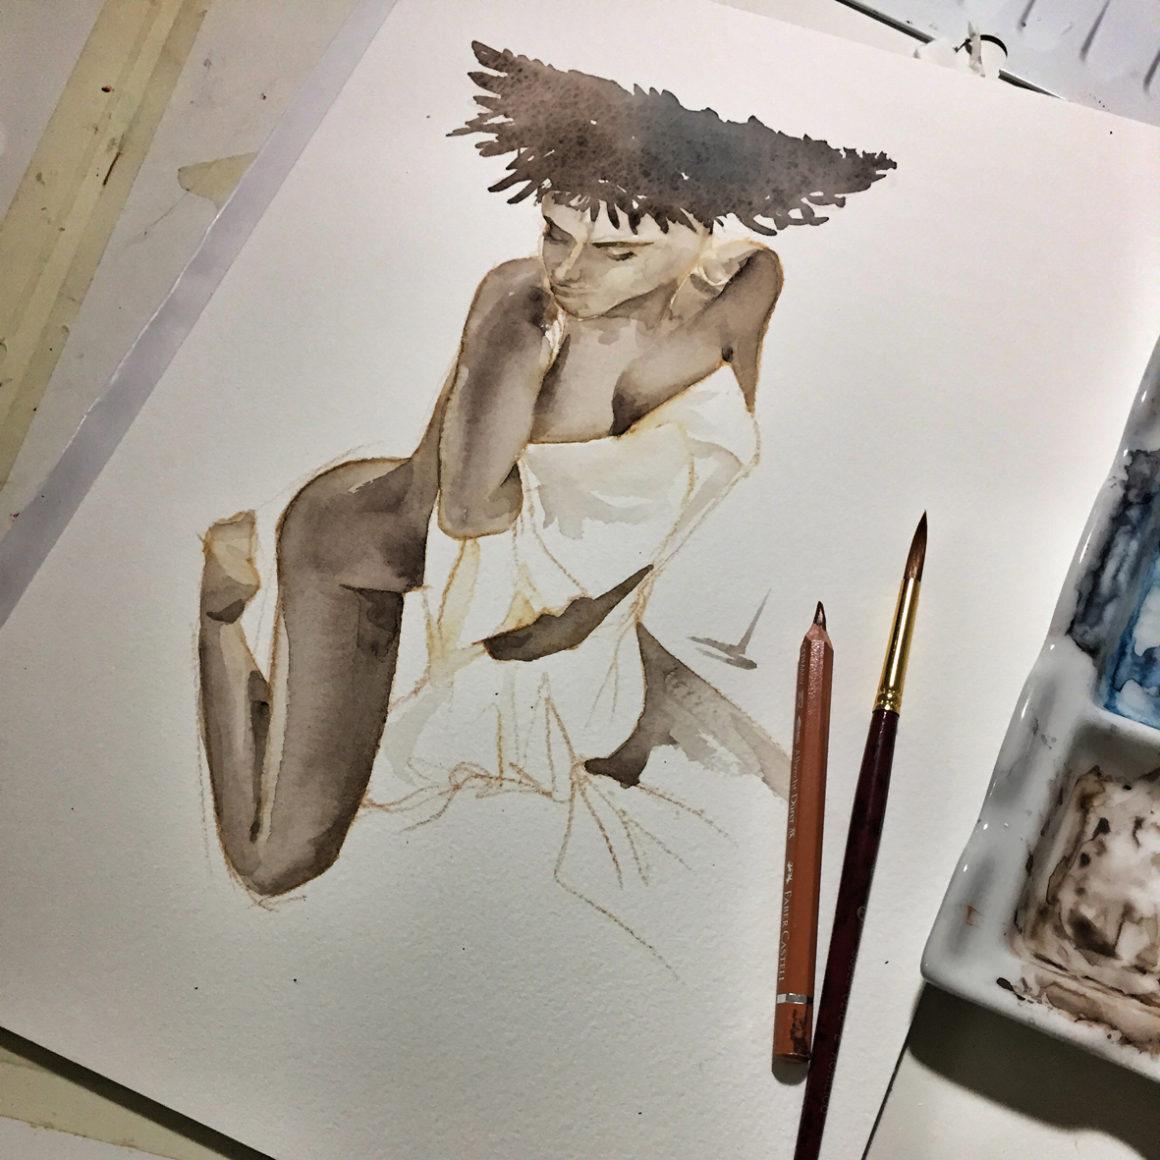 011 Samy Vito Lentini Designer Acquarelli Sketches